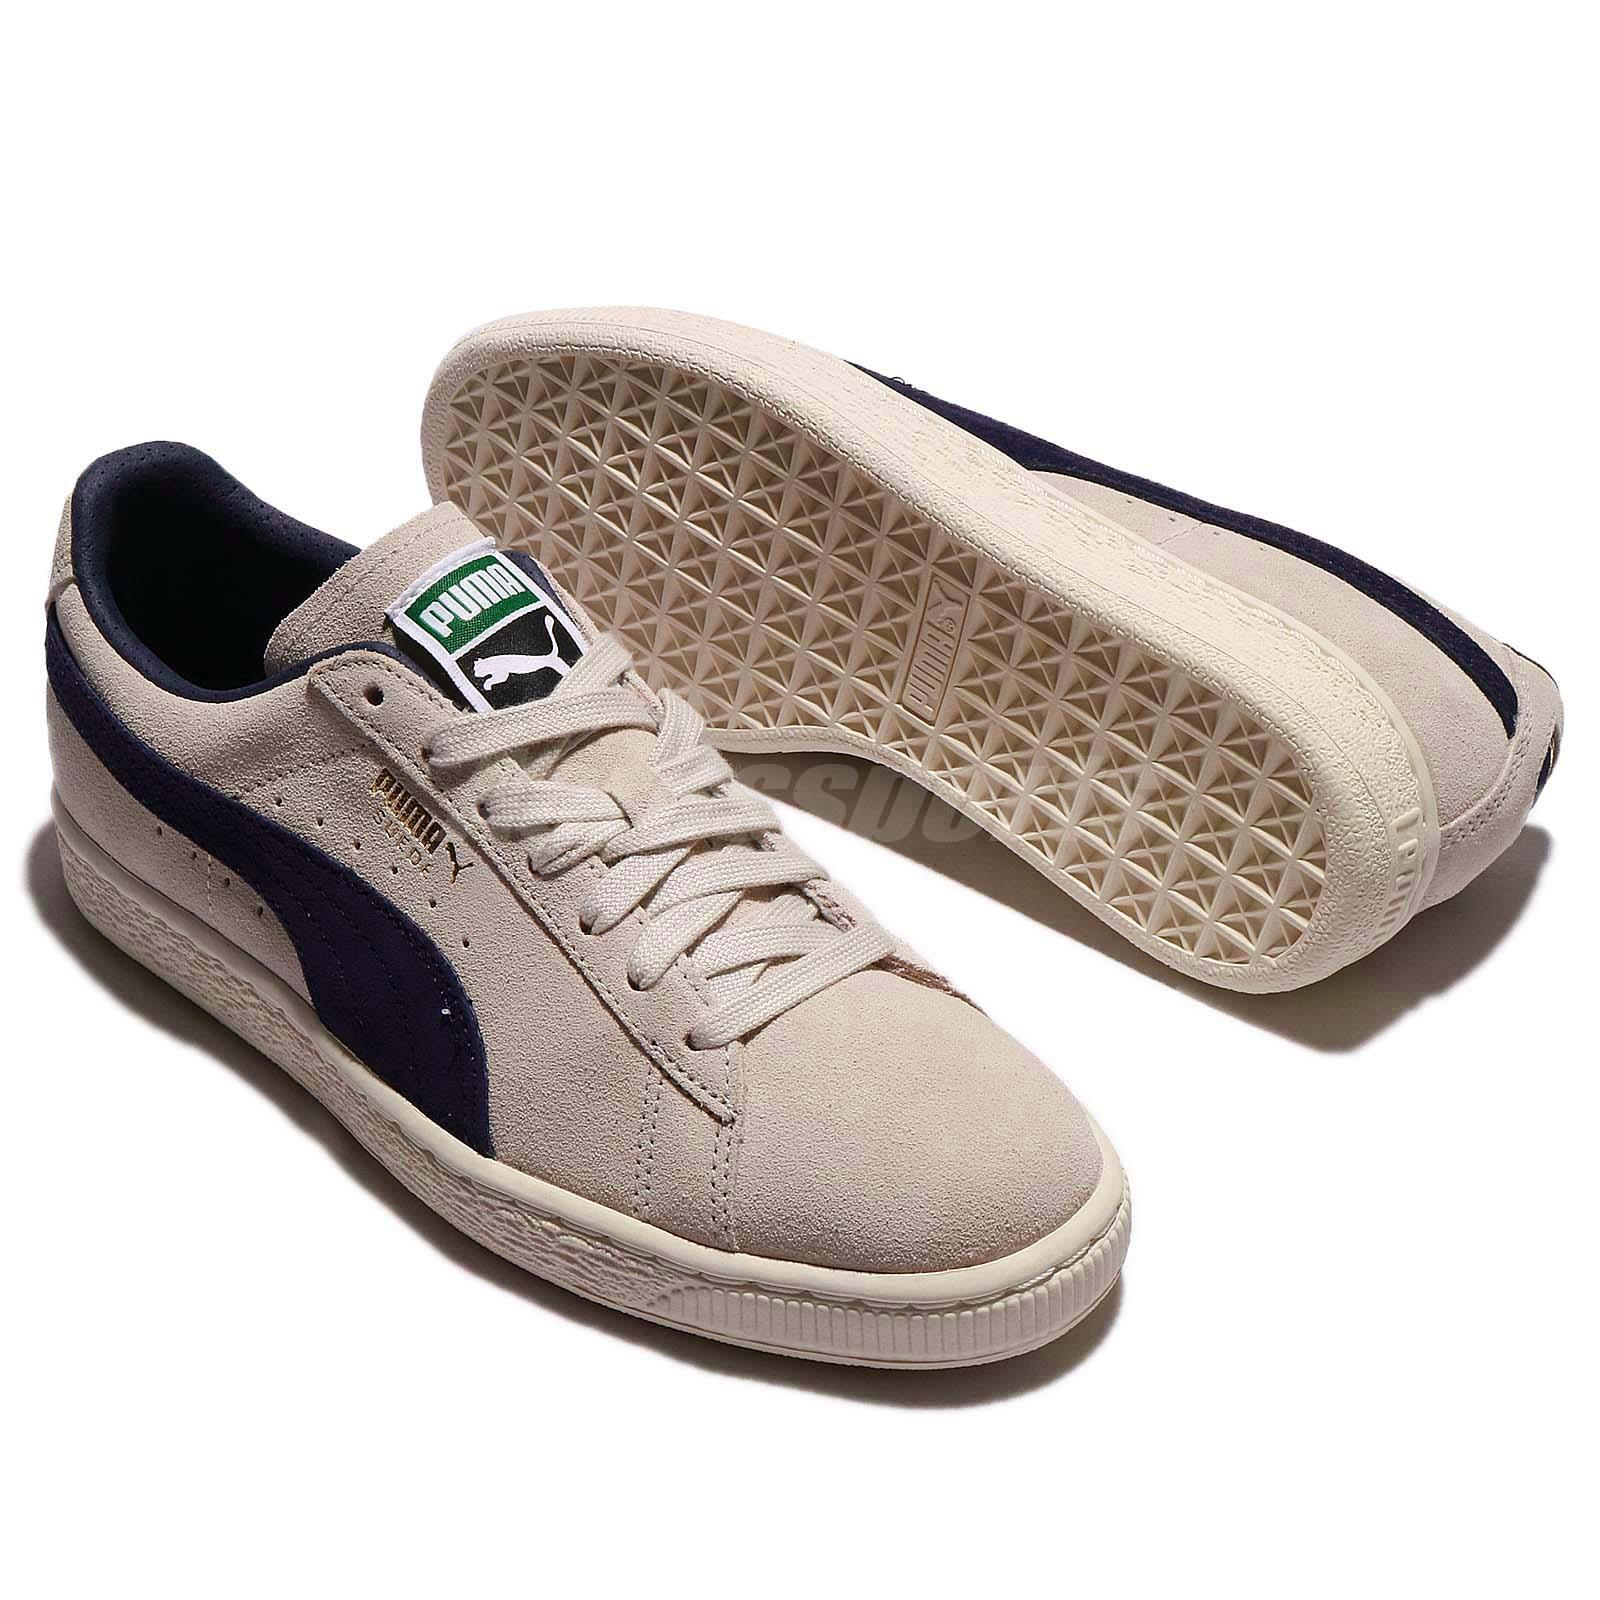 Puma Suede Classic Archive Low Birch Peacoat Men Shoes Sneakers ... 6728d8dba